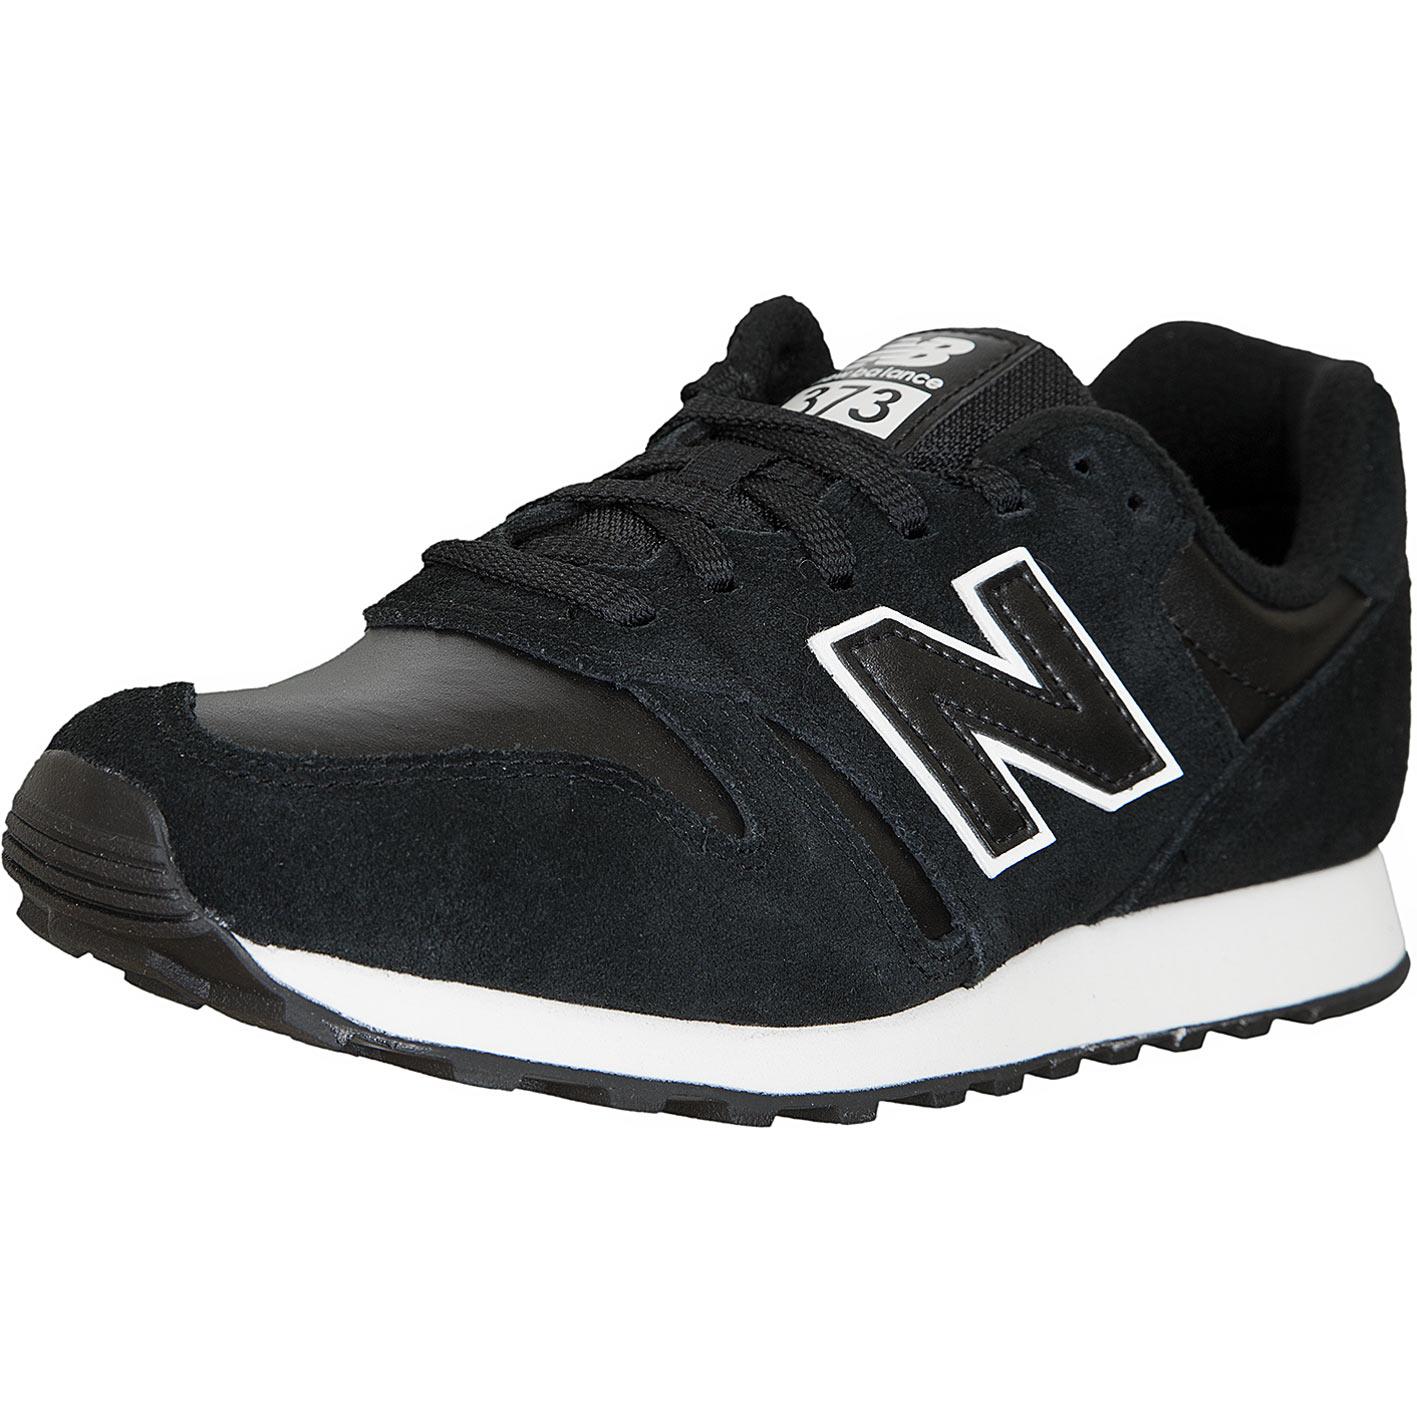 ☆ New Balance Damen Sneaker 373 Leder/Synthetik schwarz ...